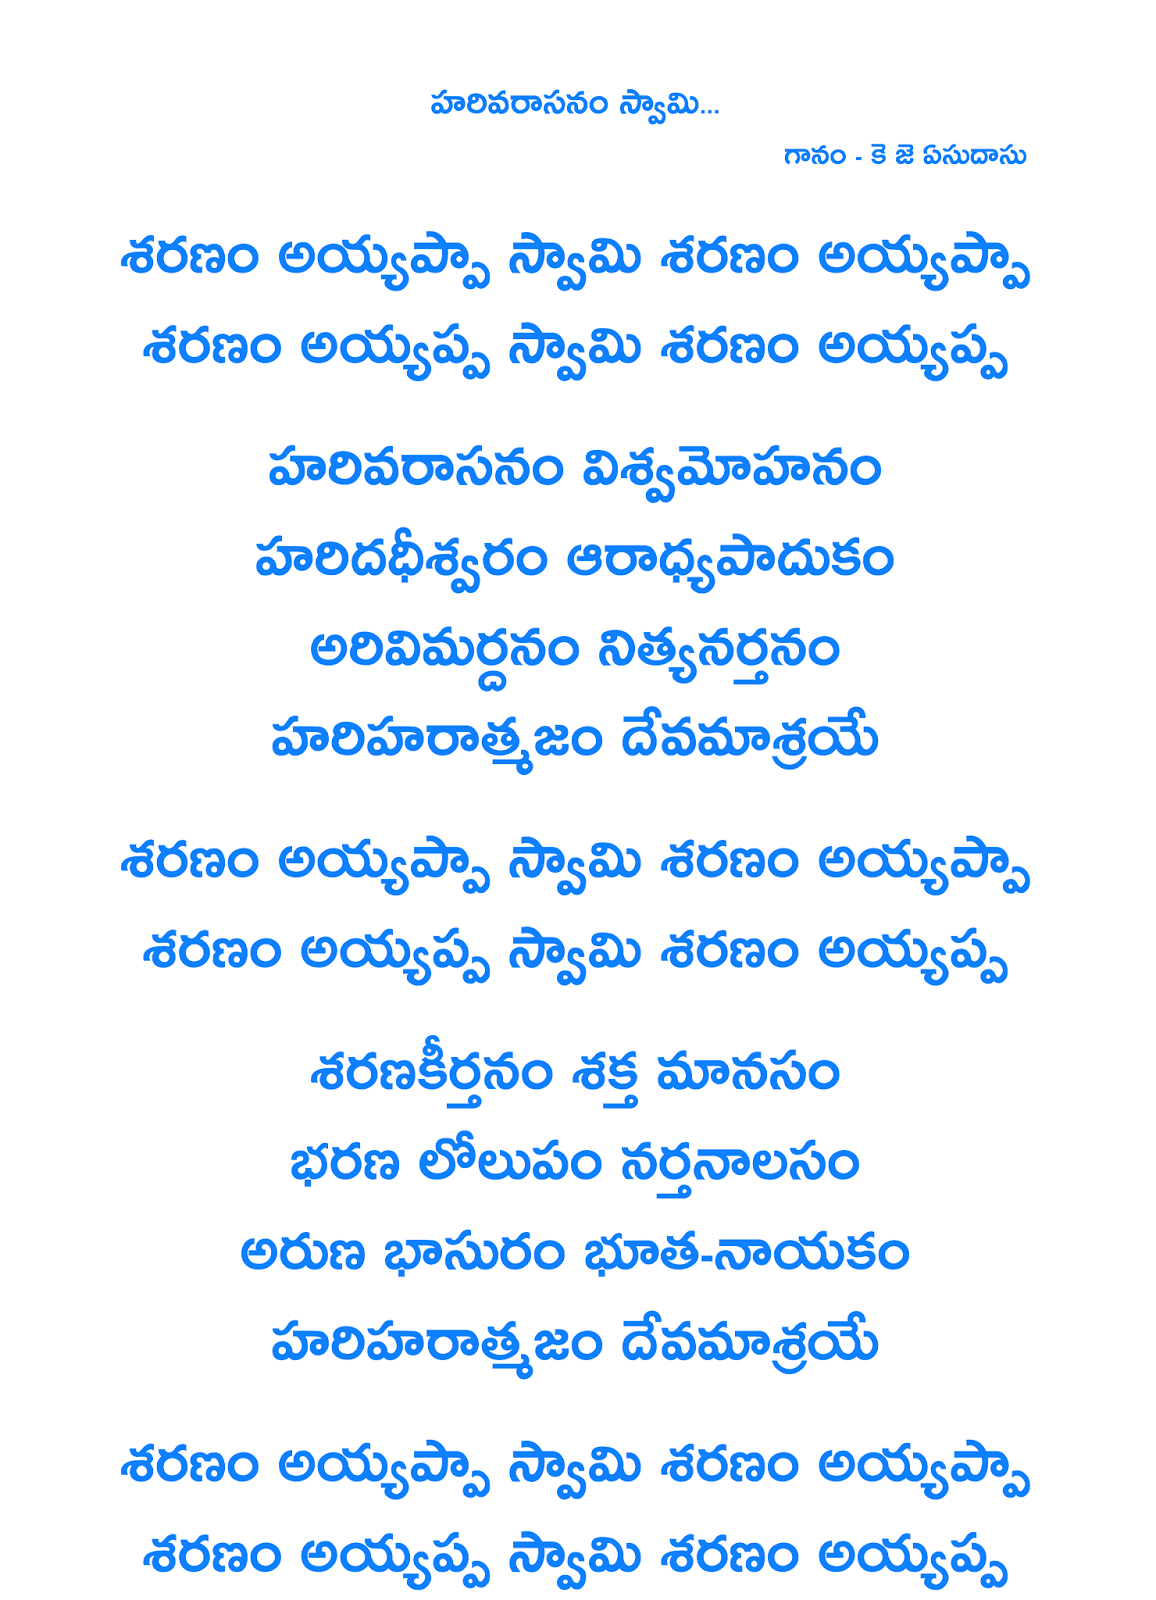 Lyrics Addaa Yesudas Harivarasanam Lyrics In Telugu Telugu Inspirational Quotes Devotional Quotes Spiritual Quotes God